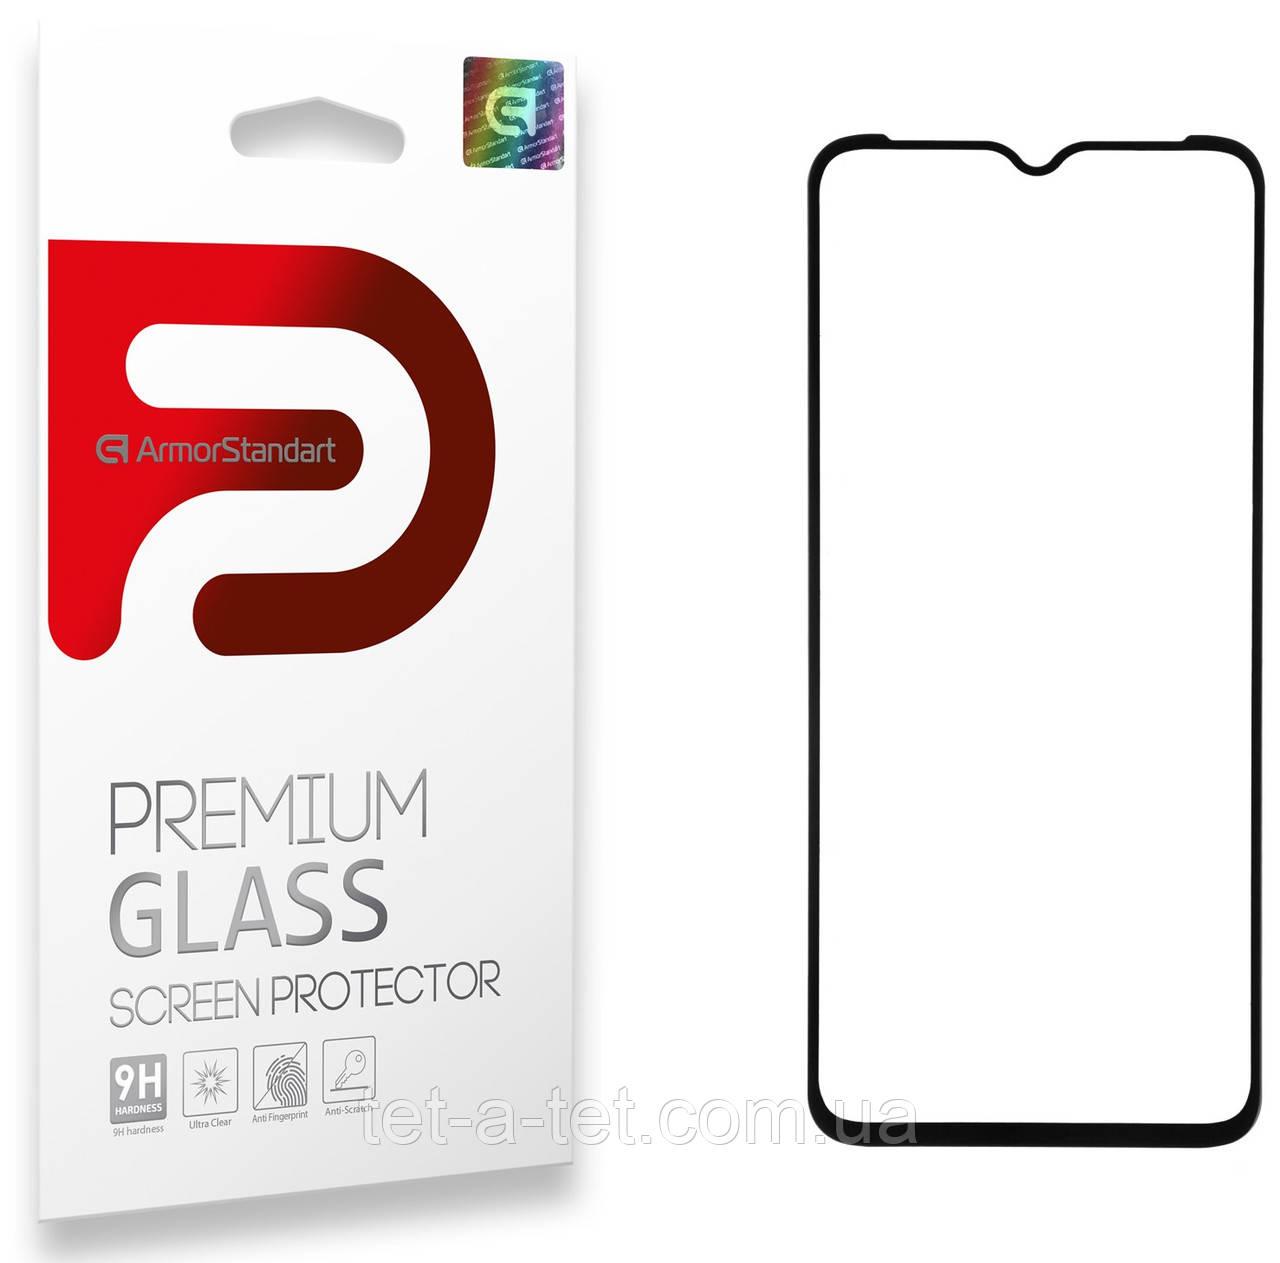 Защитное стекло Armorstandart Full Glue для TECNO Spark 6 Go (KE5) Black (premium glass)